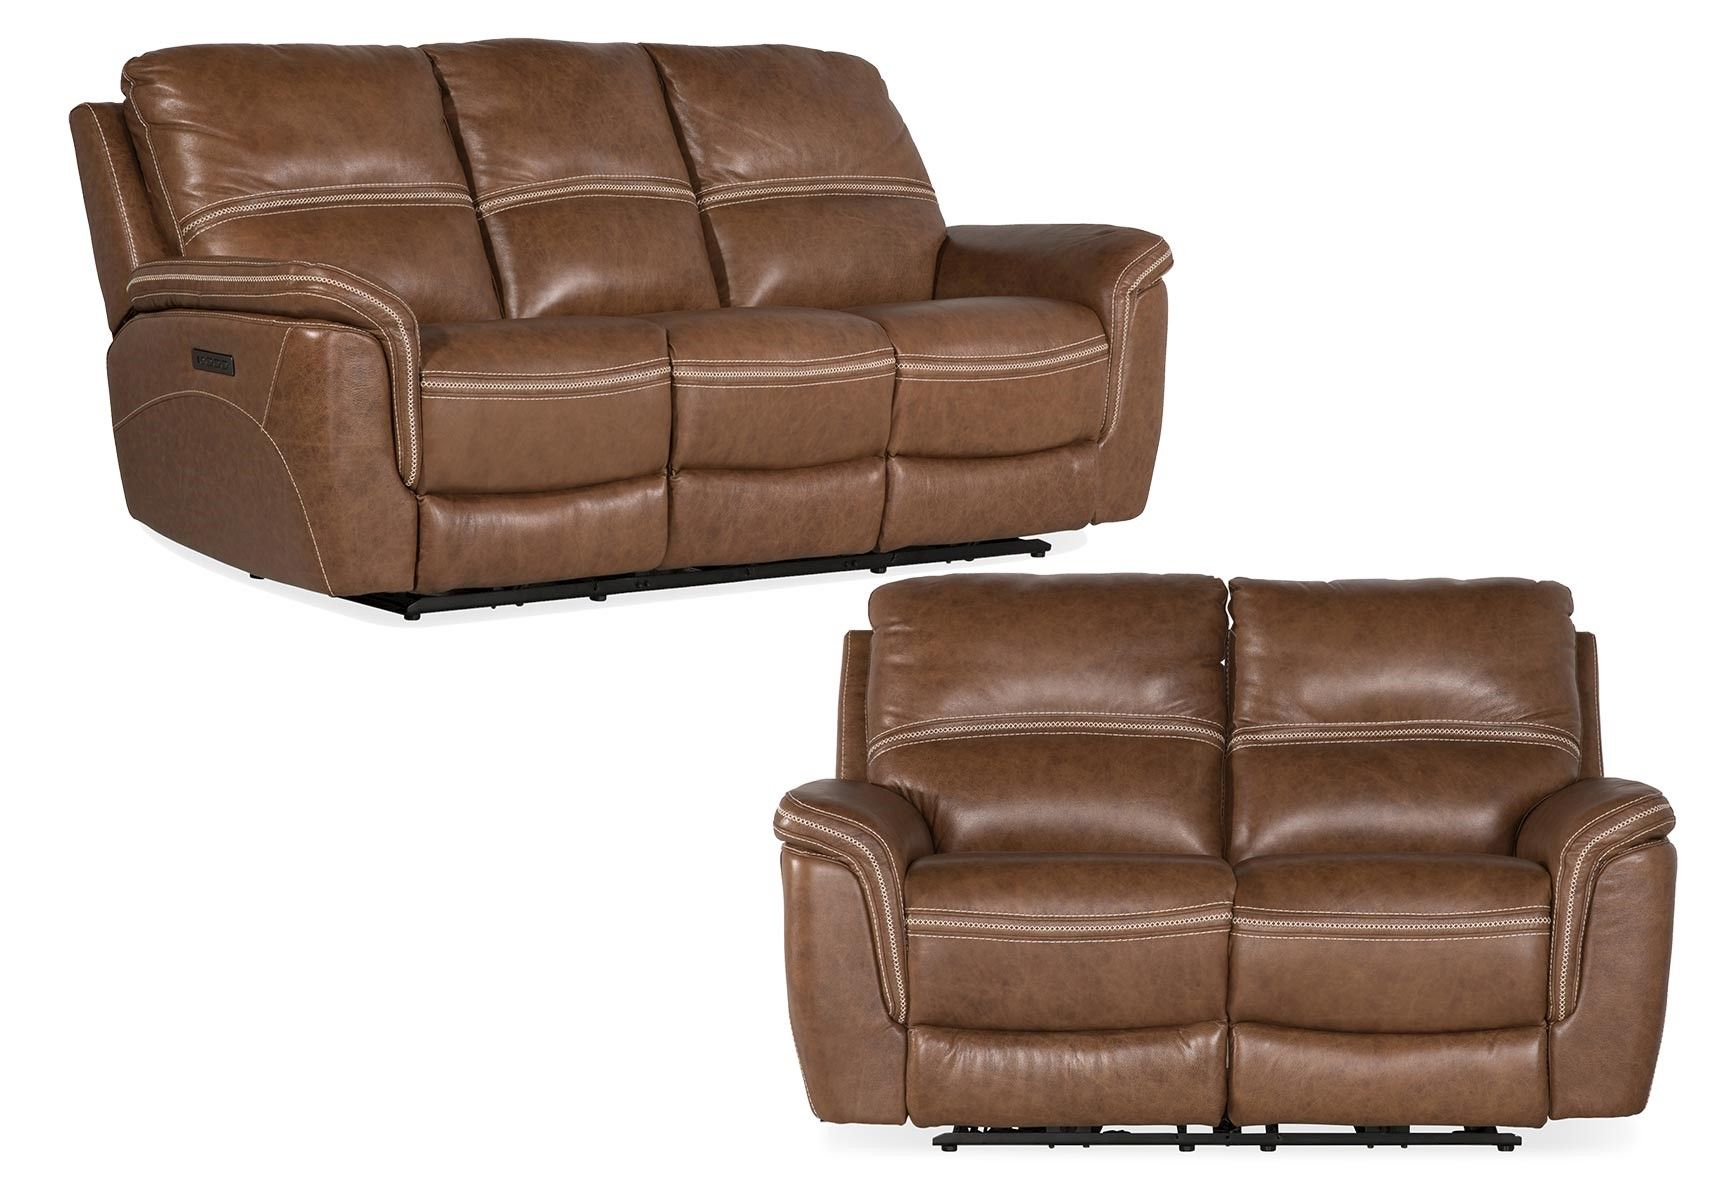 Lacks Bruno 2 Pc Power Reclining Living Room Set Living Room Sets Power Recliners Recliner #power #living #room #sets